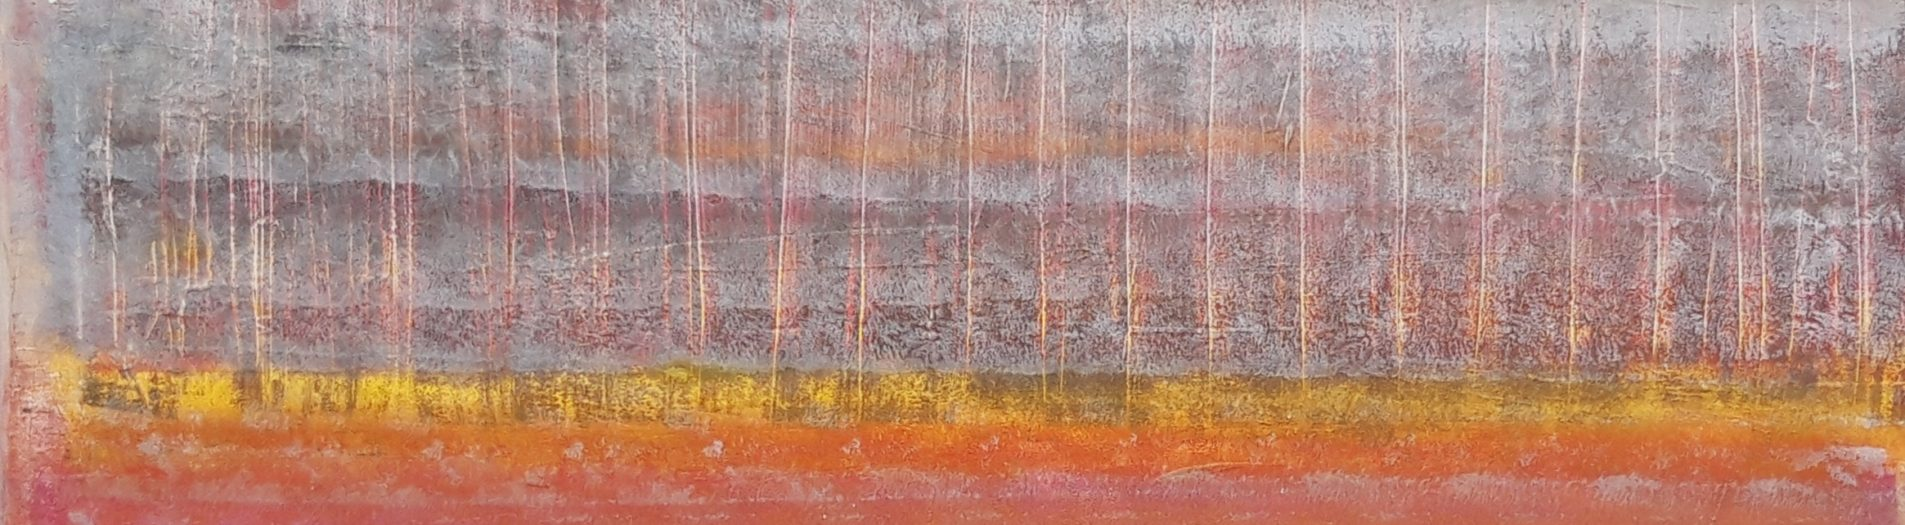 Abstrakte Farbflächen